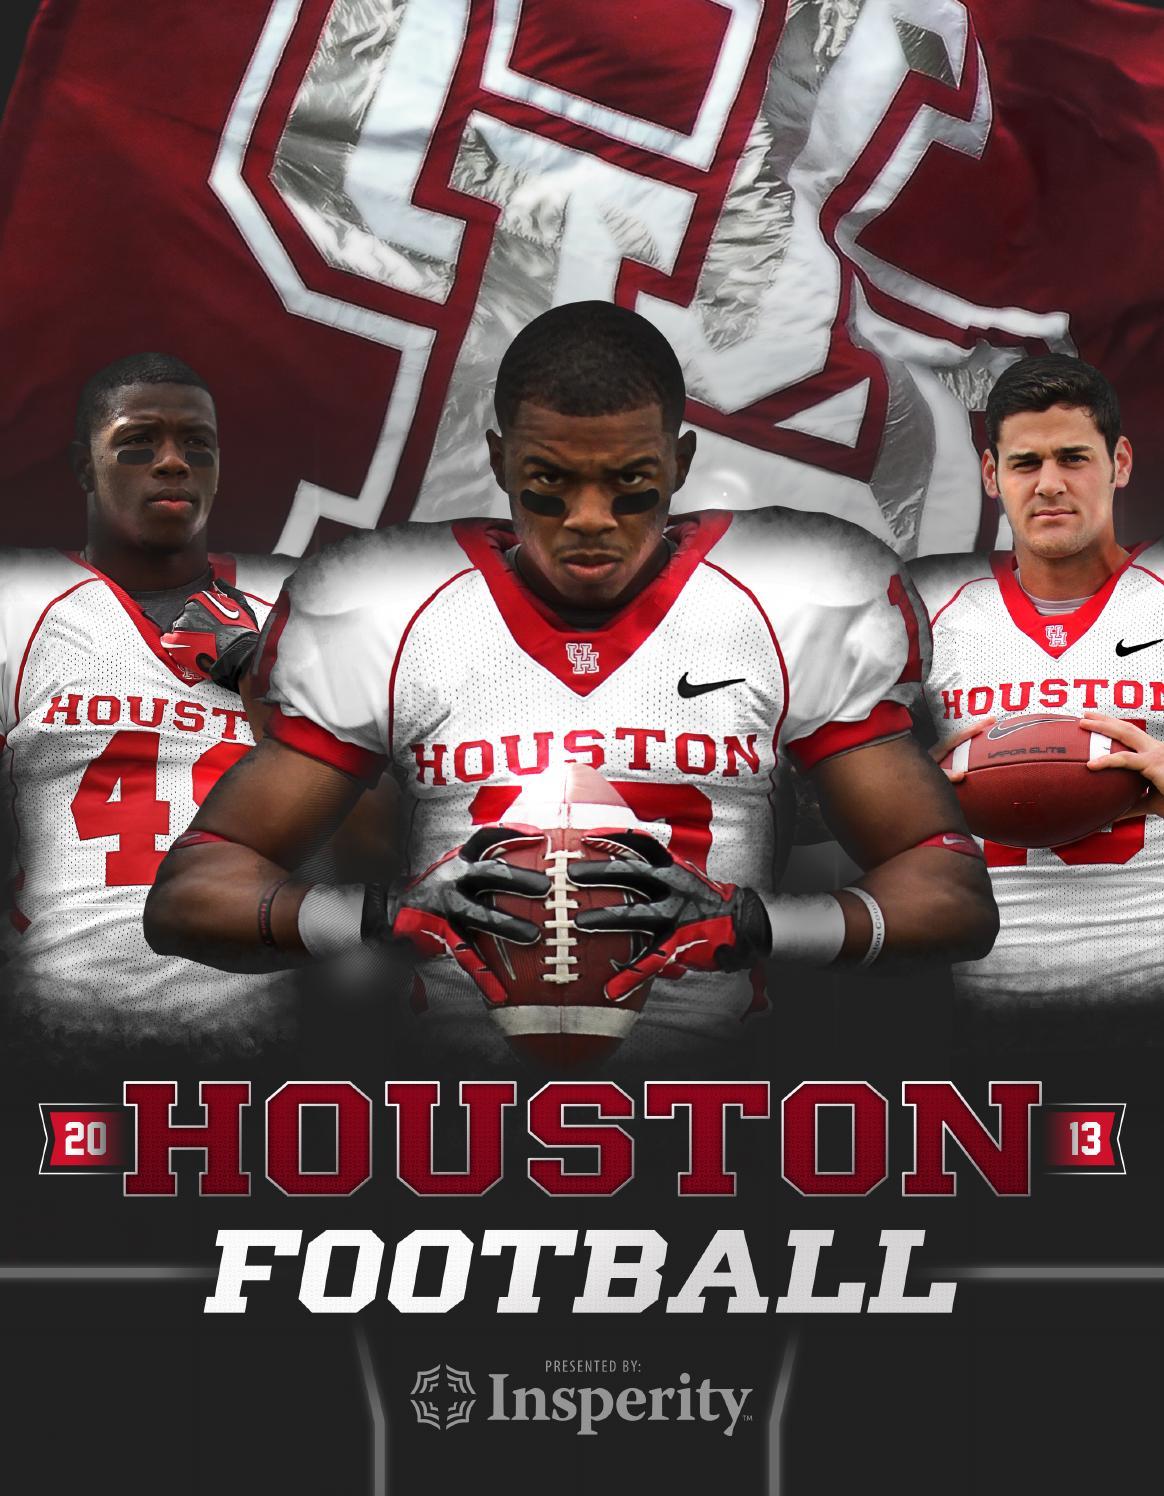 2013 Houston Football Media Guide by David Bassity - issuu